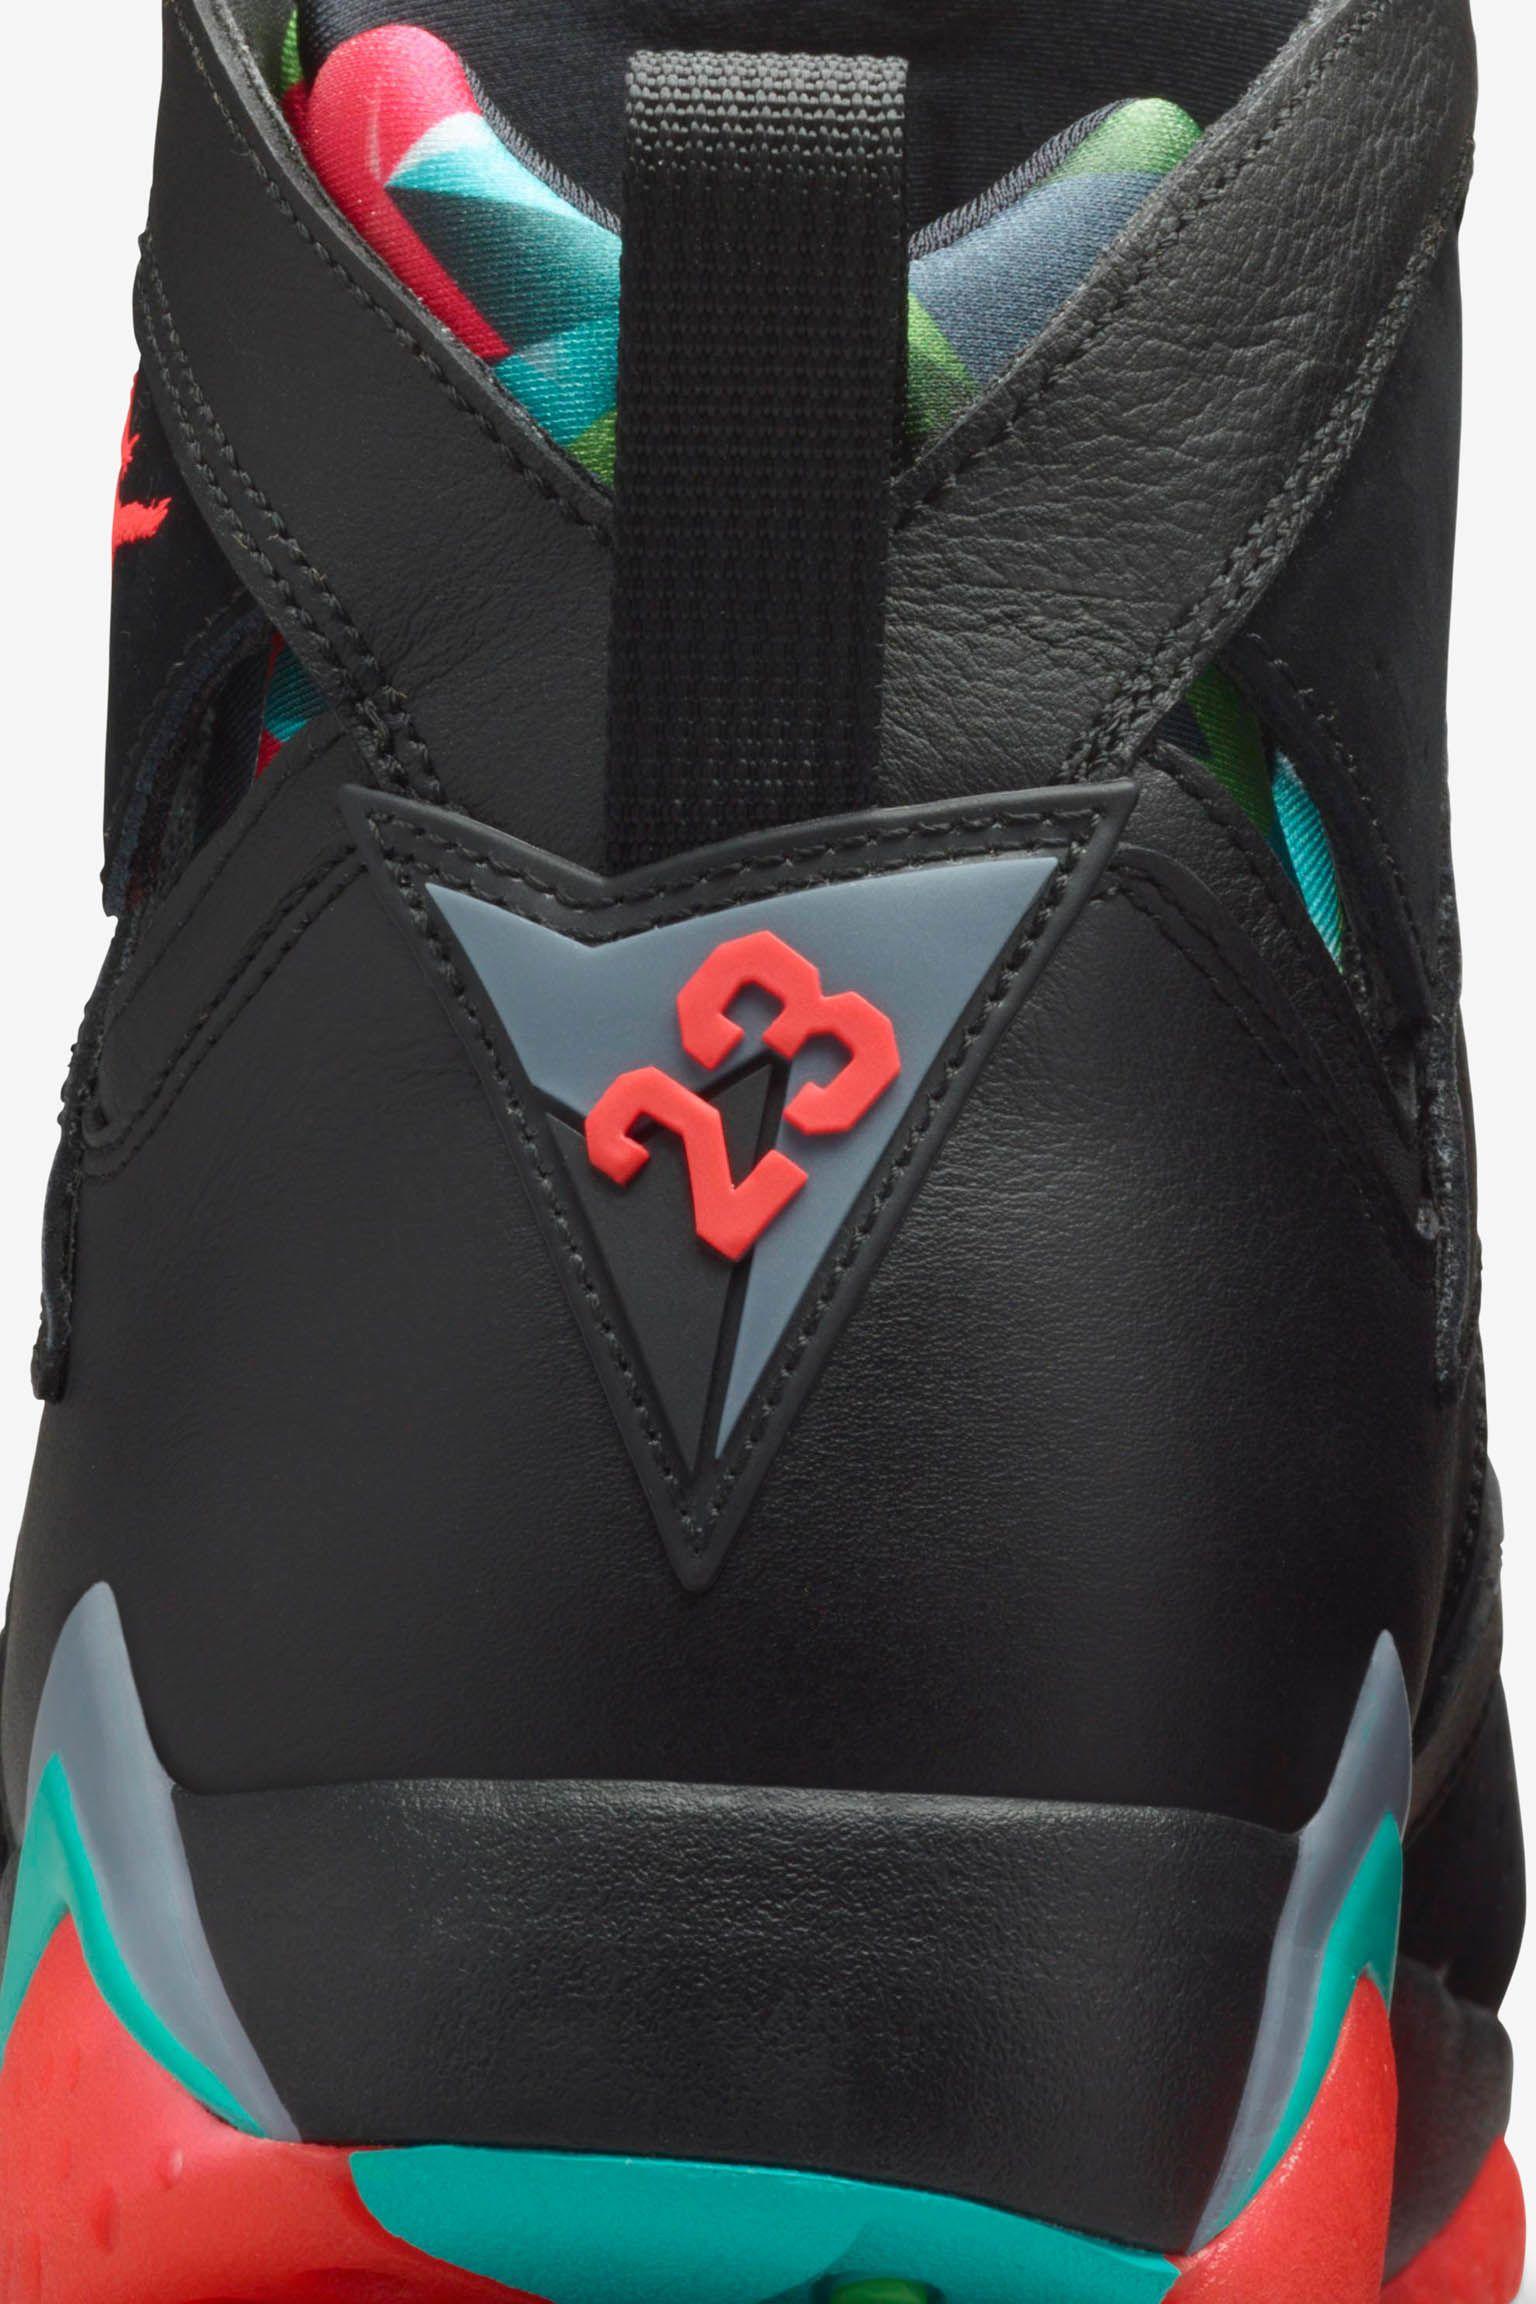 Air Jordan 7 Retro 'Still Dreaming' Release Date